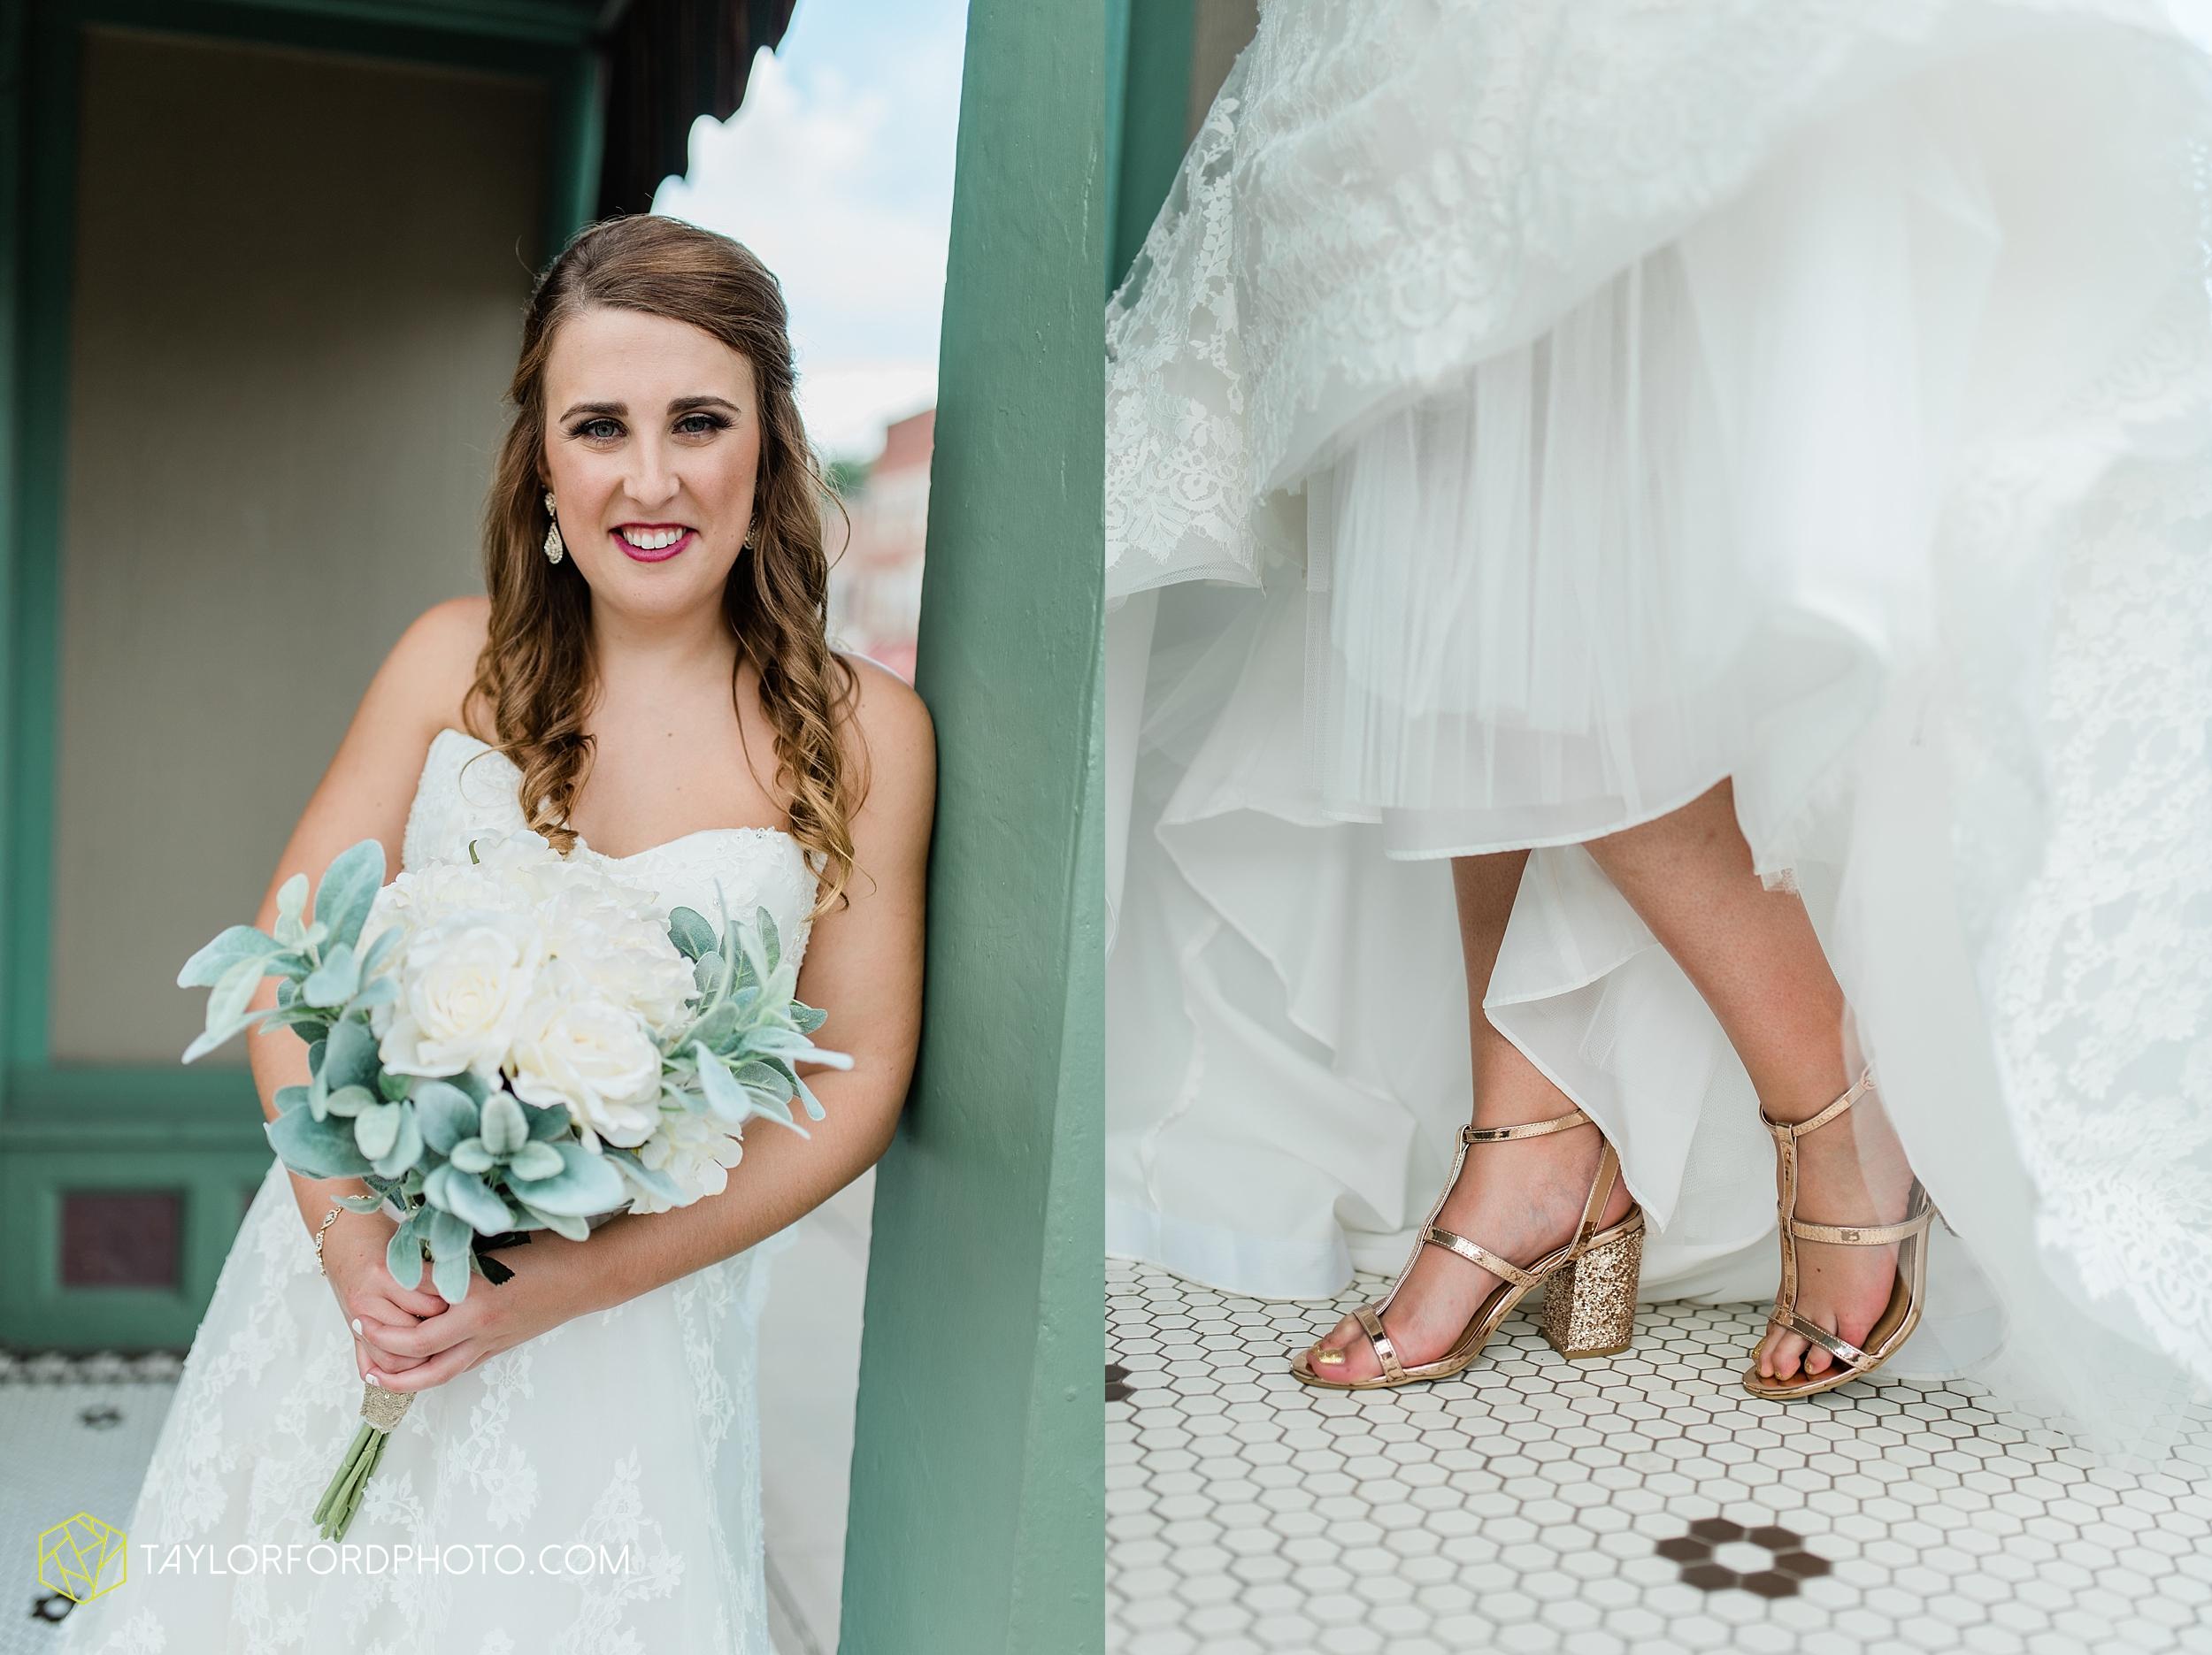 chelsey-zosh-jackson-young-first-united-methodist-church-senior-center-van-wert-ohio-wedding-photographer-taylor-ford-photography_0058.jpg